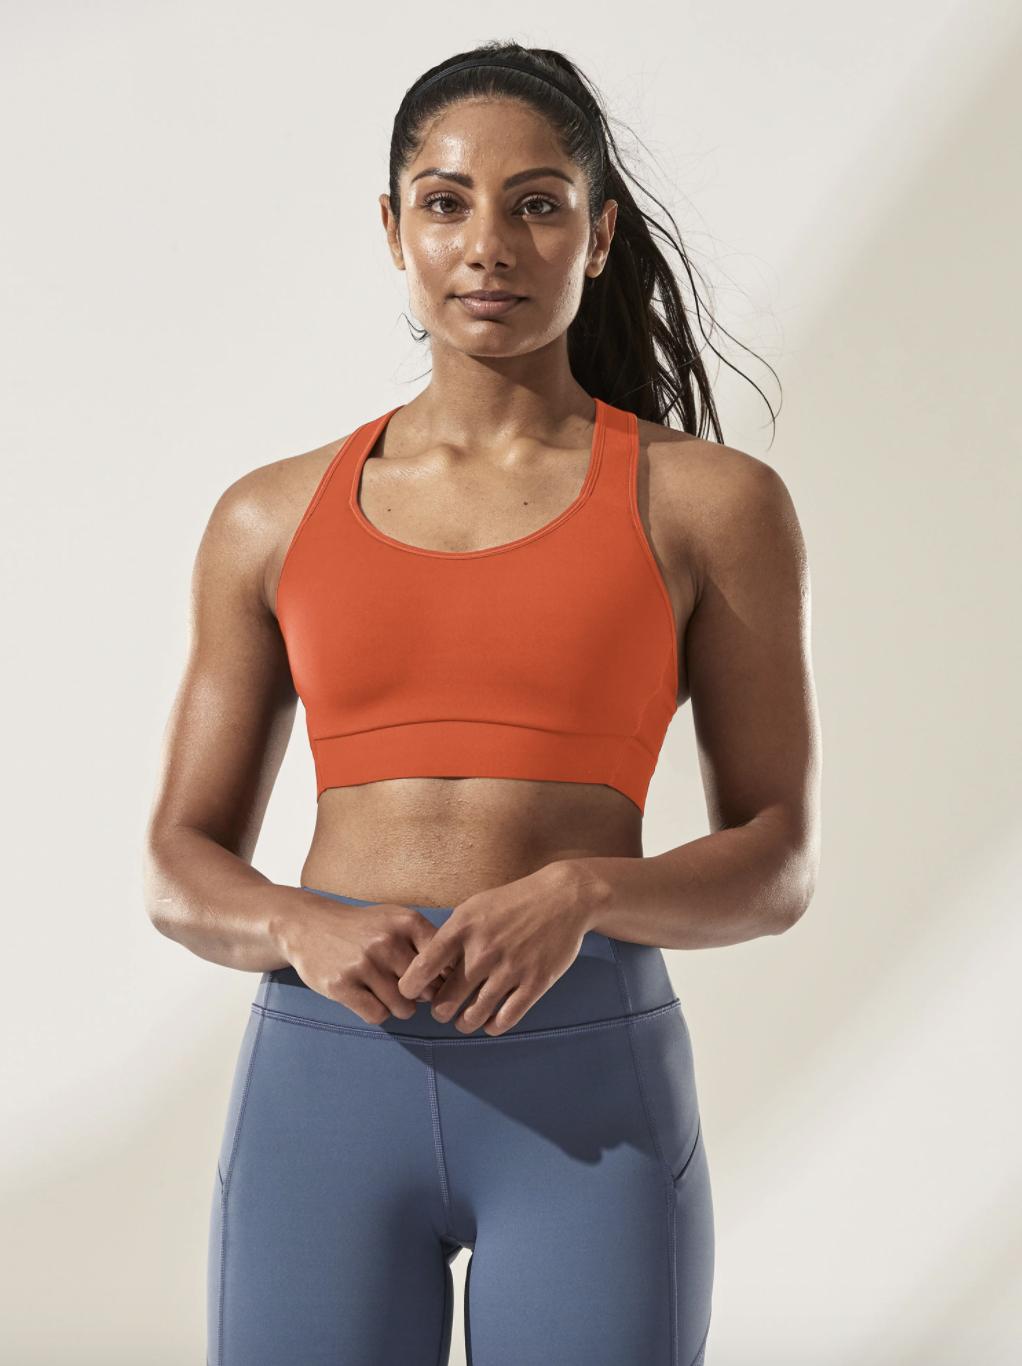 A model wearing the basic looking u-neck sports bra